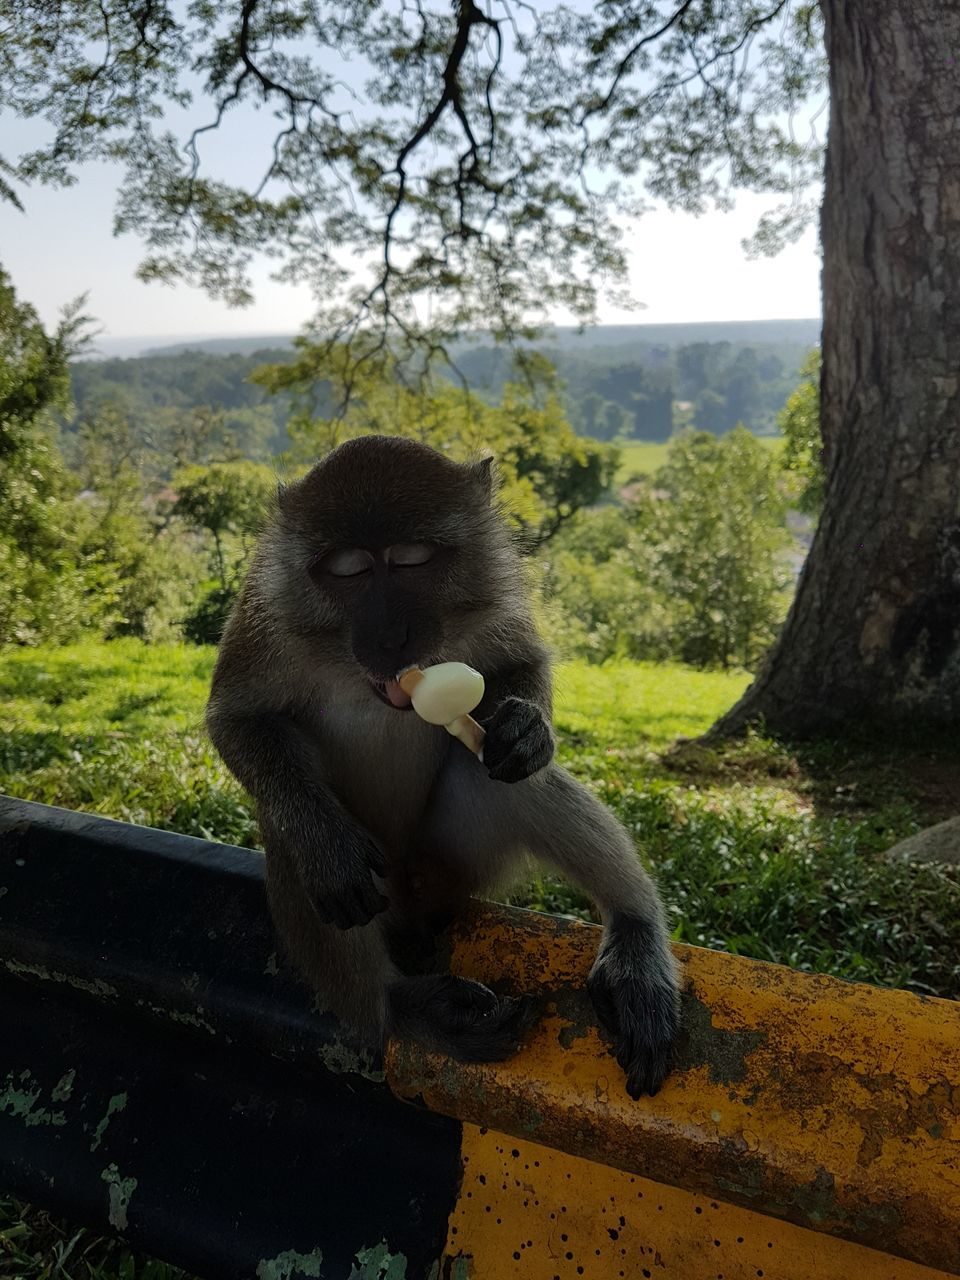 tree, animal themes, animals in the wild, one animal, animal wildlife, mammal, day, no people, outdoors, monkey, nature, sitting